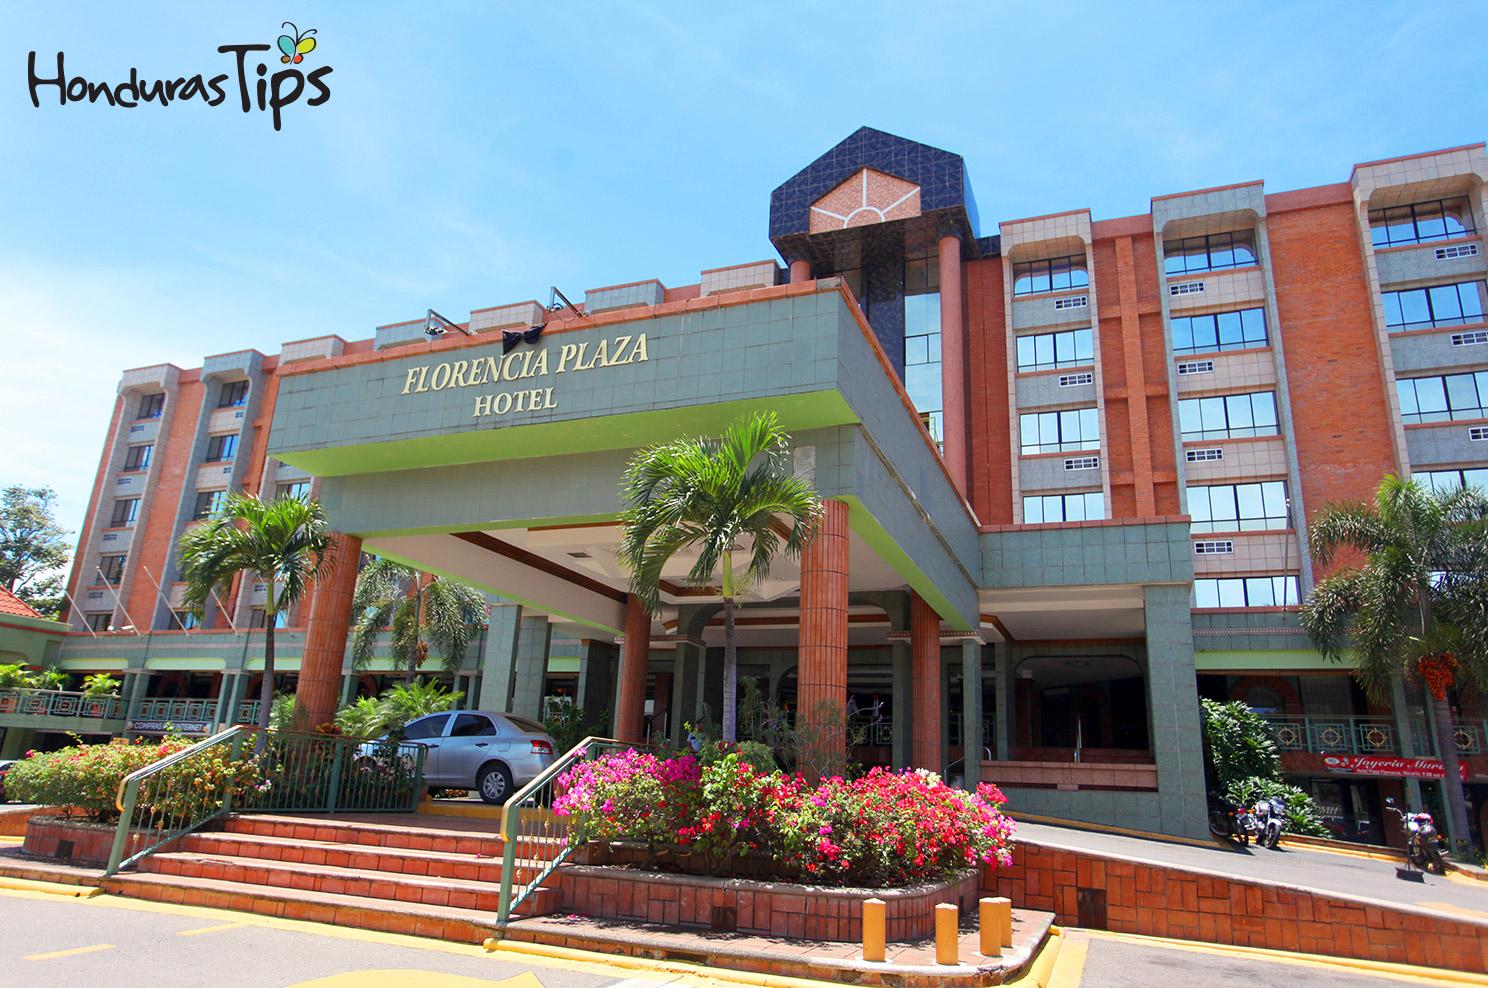 Florencia Plaza Hotel  Honduras Tips